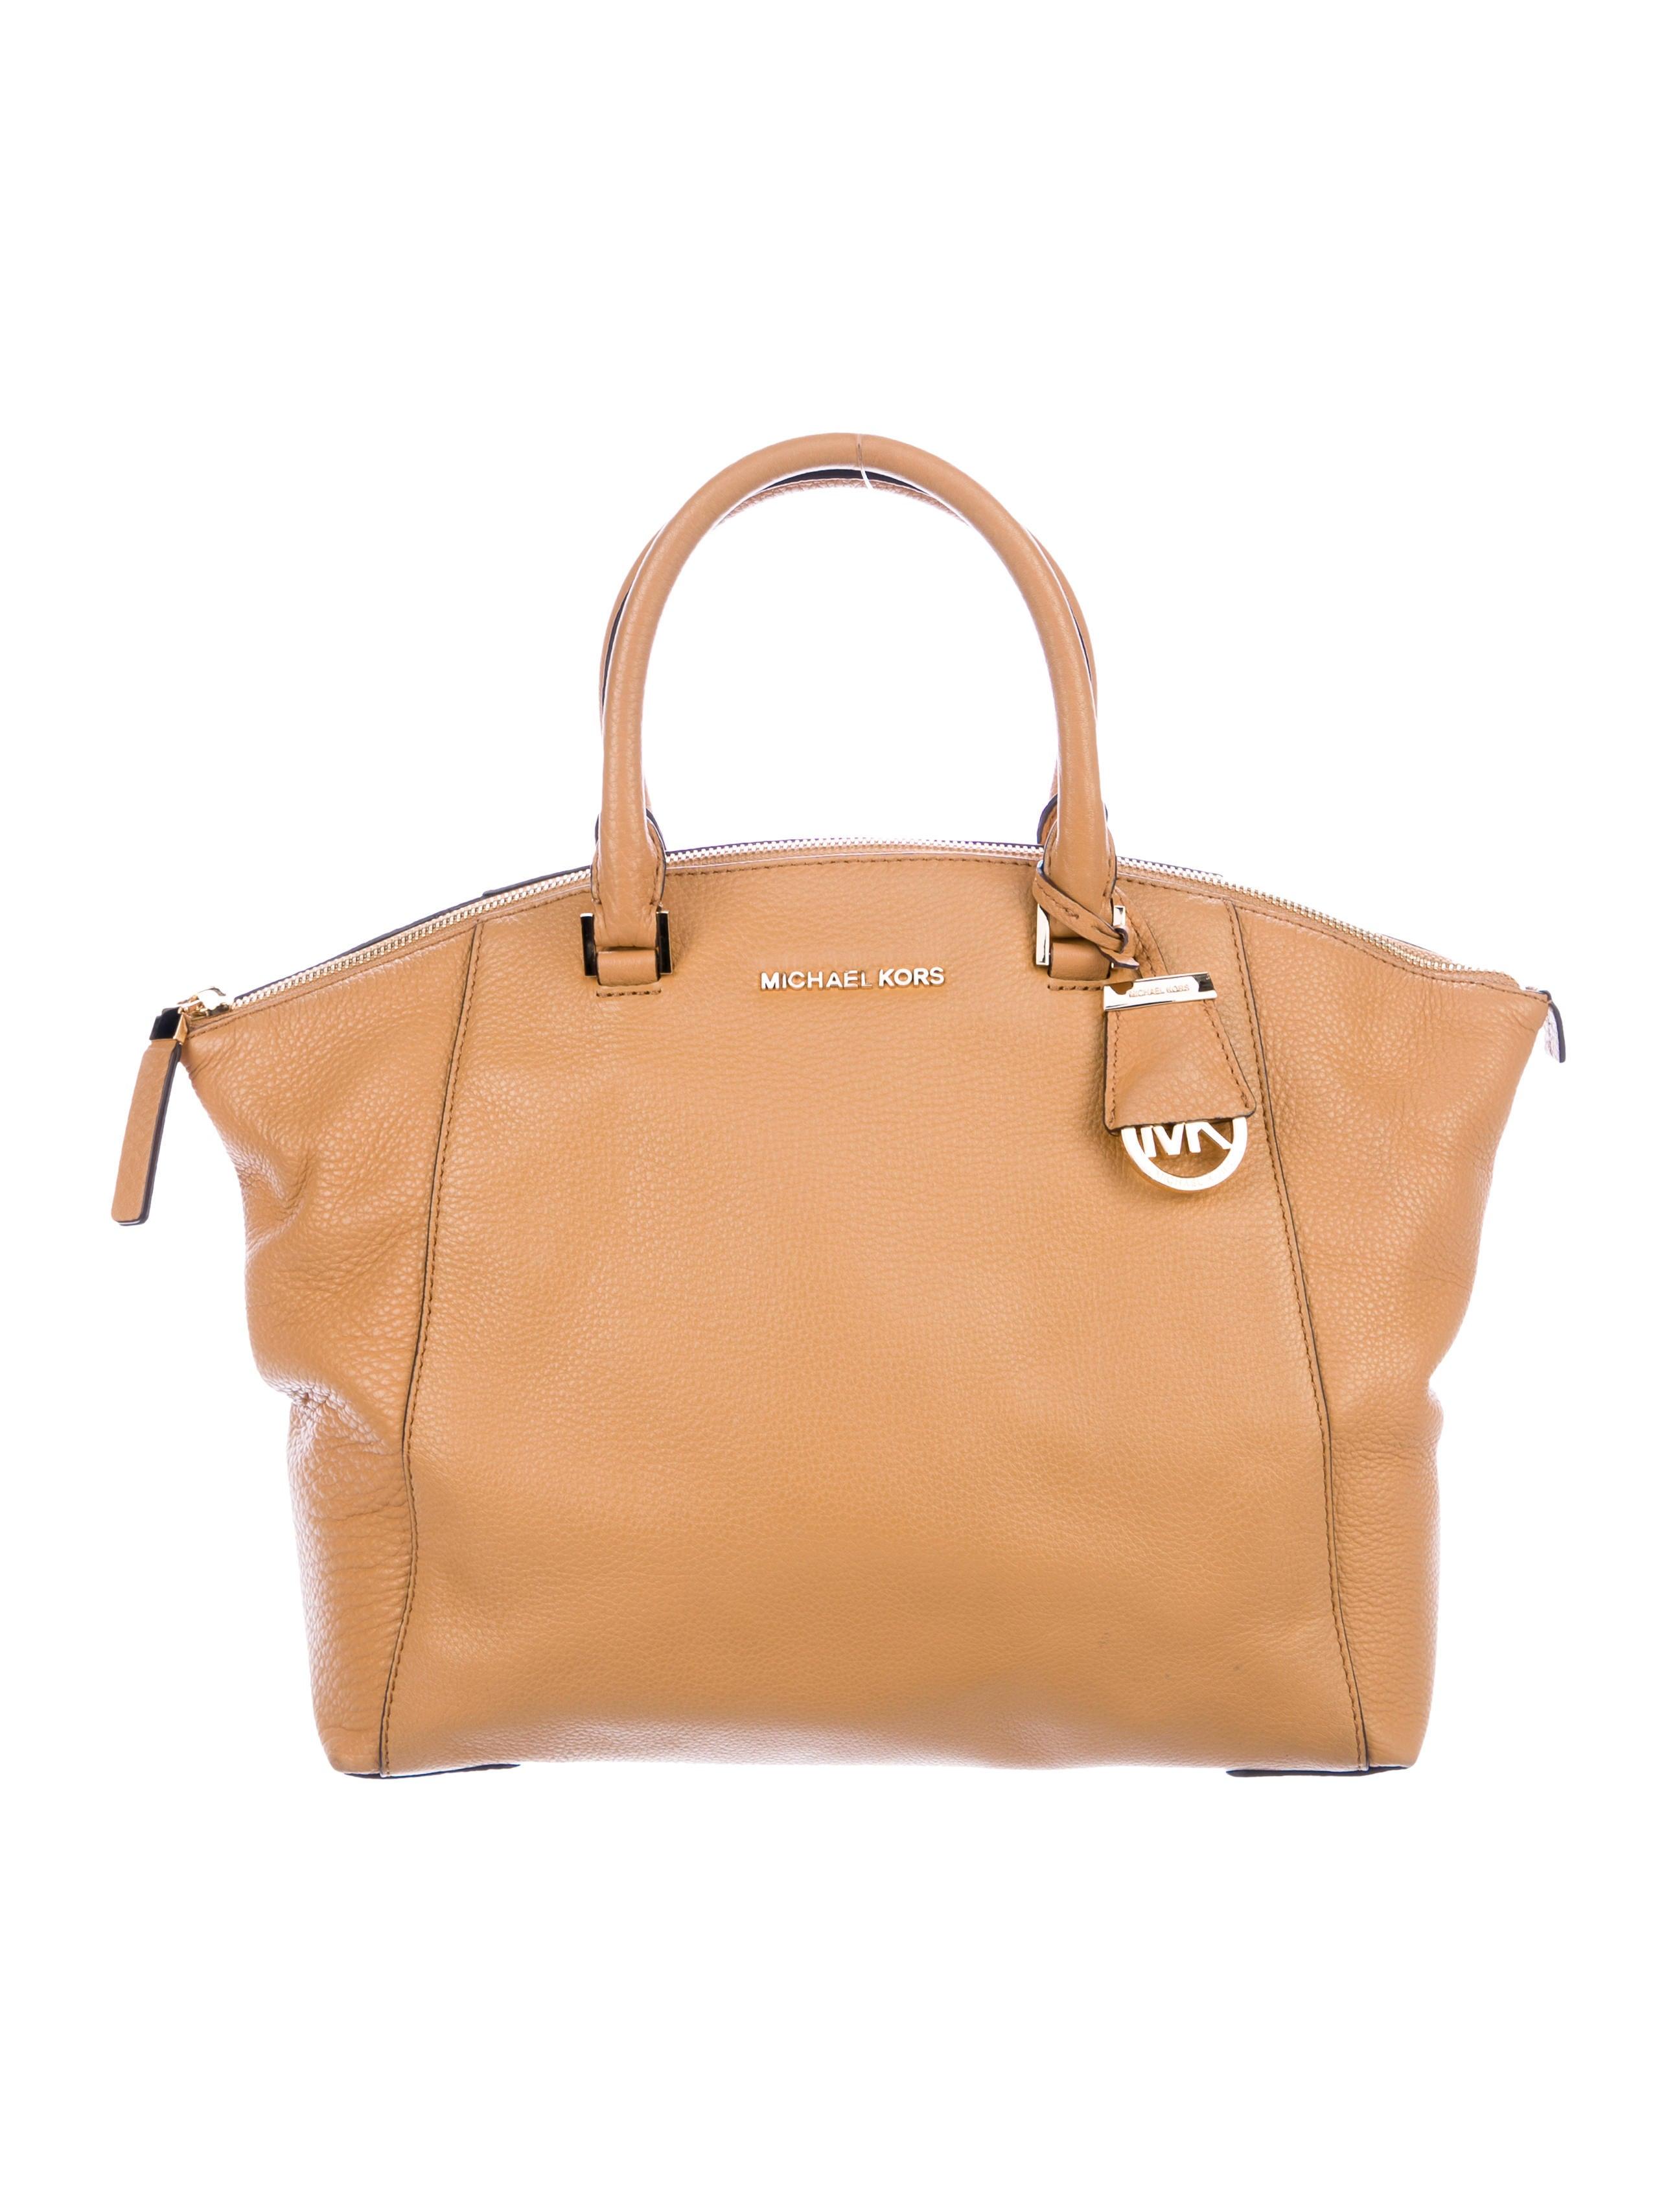 0fa53ff7ae2dbd Michael Michael Kors Grained Leather Satchel - Handbags - WM537432 ...